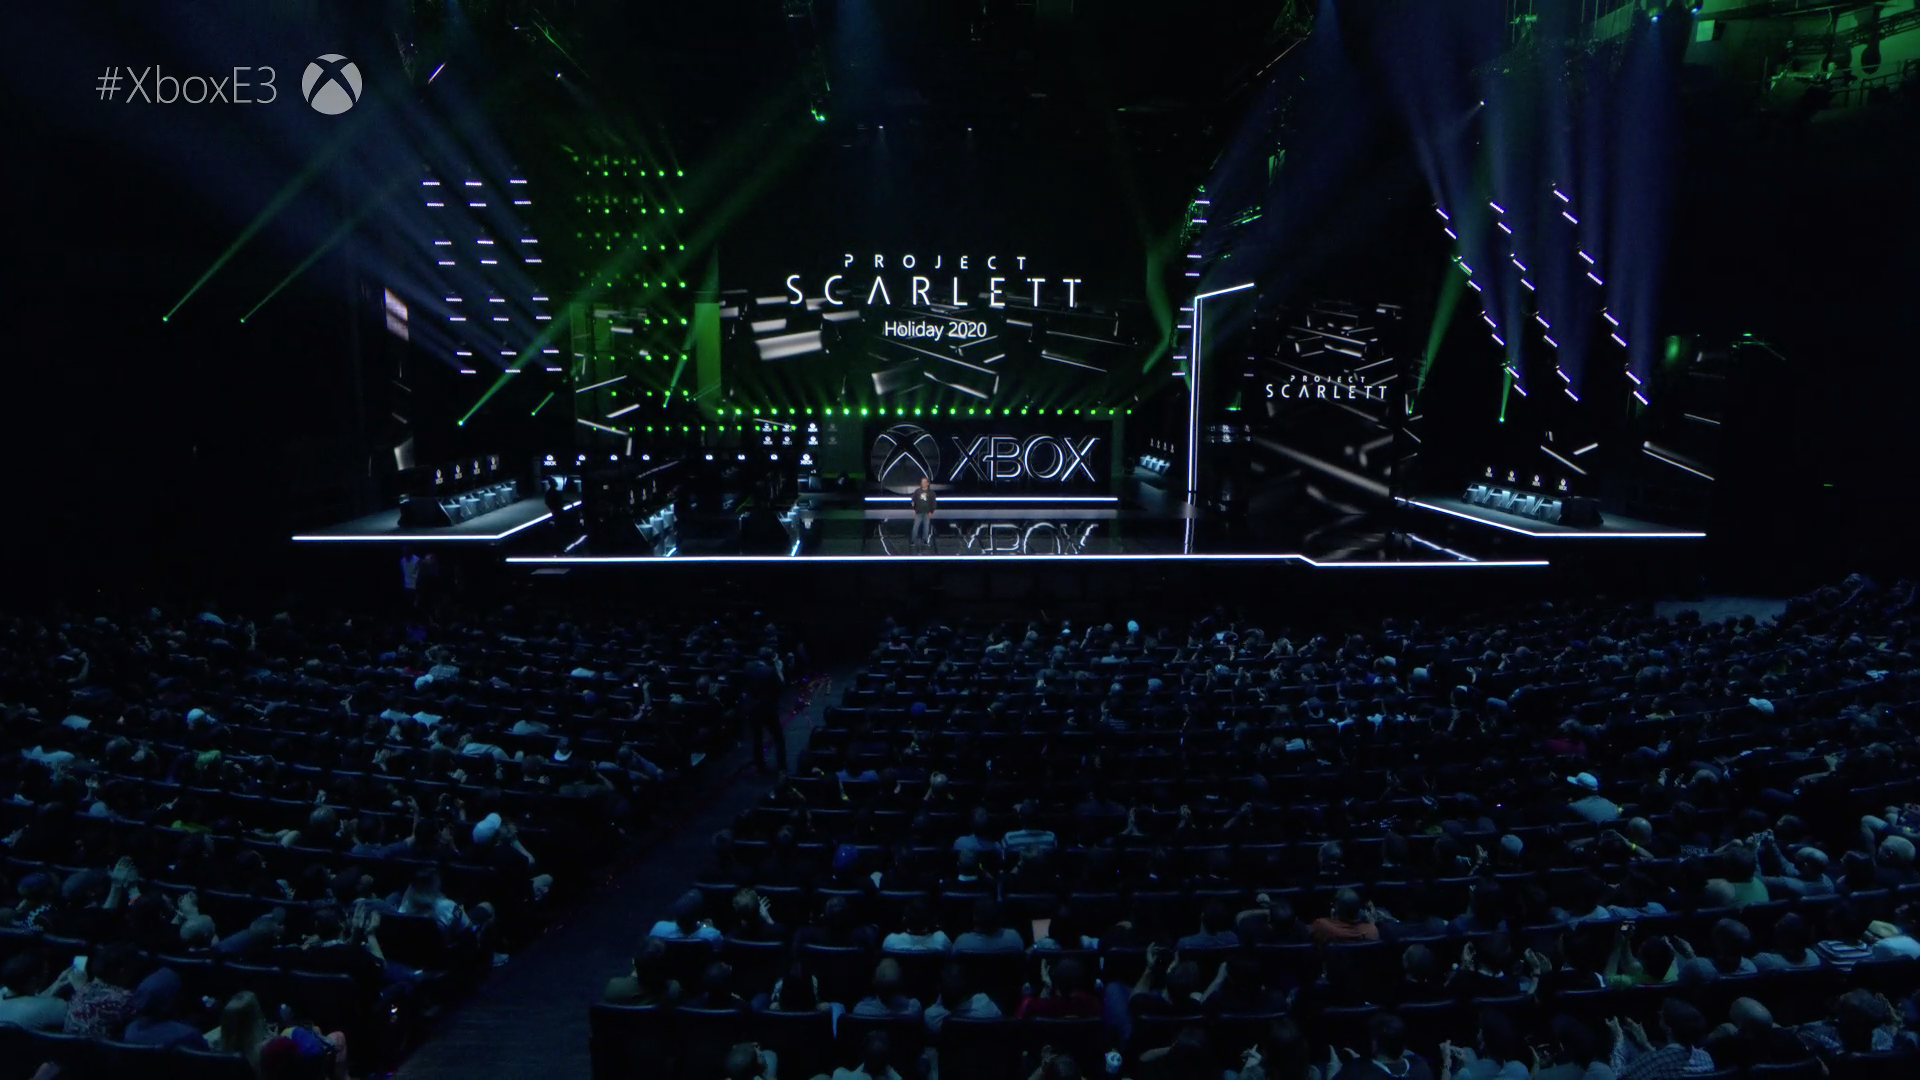 Microsoft Announces Project Scarlett, The Next-Gen Xbox